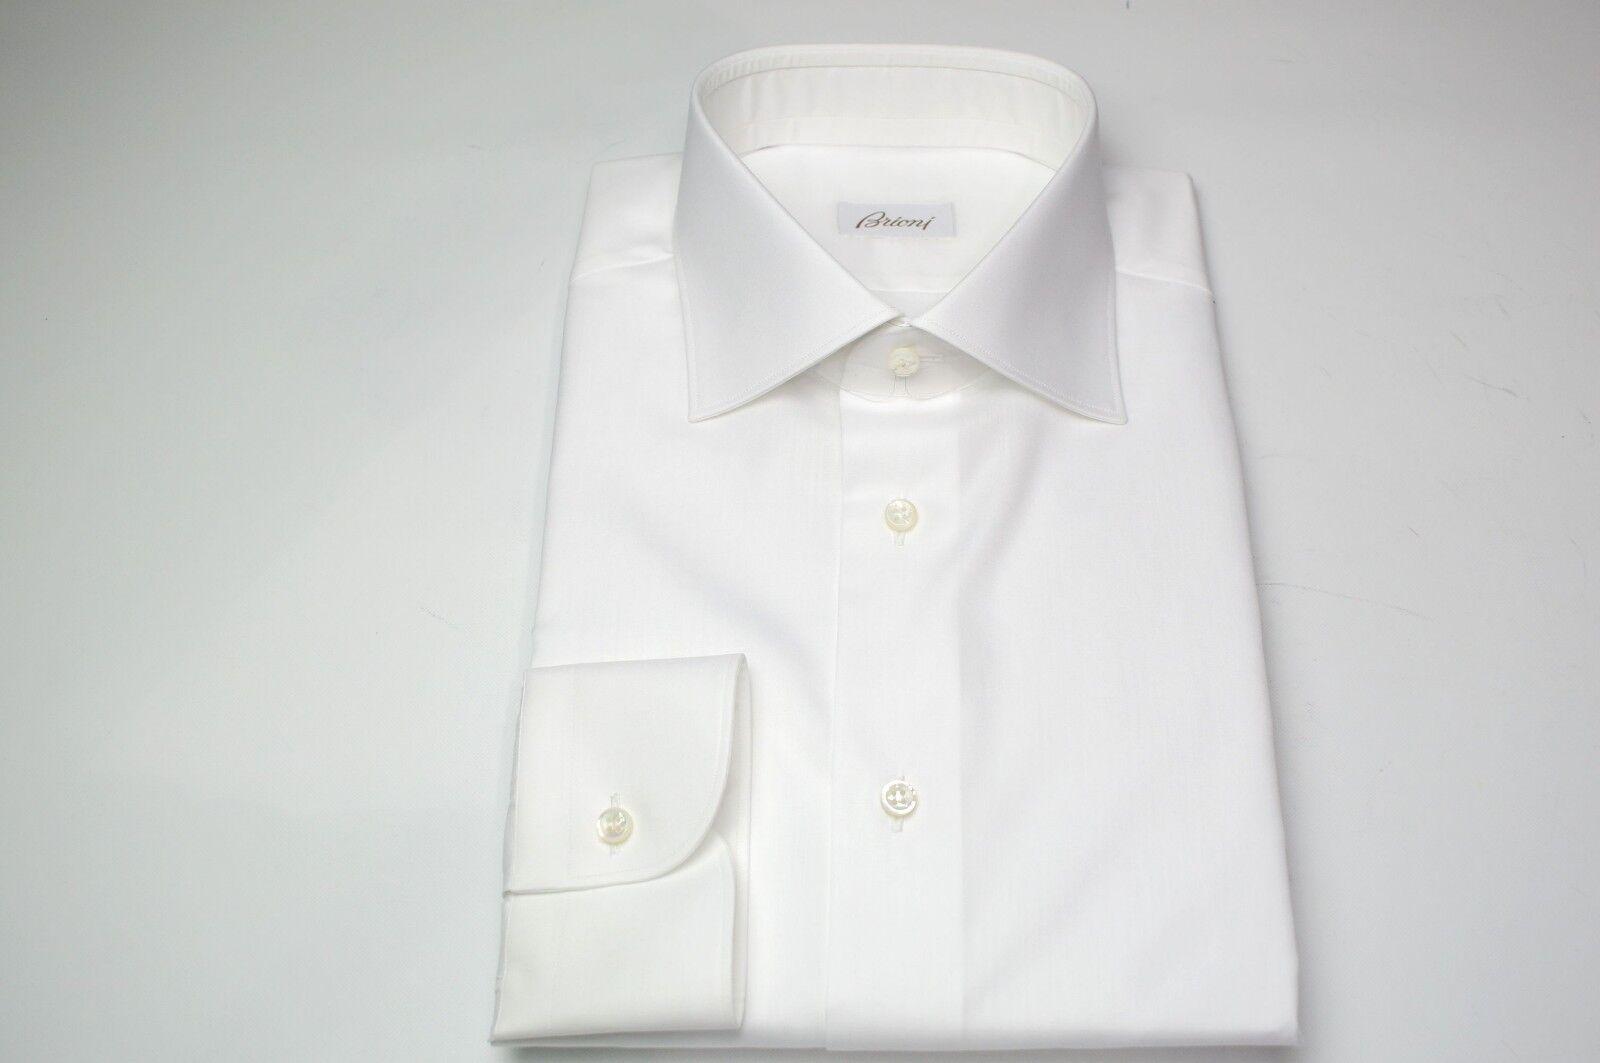 NEW BRIONI Weiß Dress hemd 100% baumwolle Größe 15.75 Us 40 Eu  (MA54)